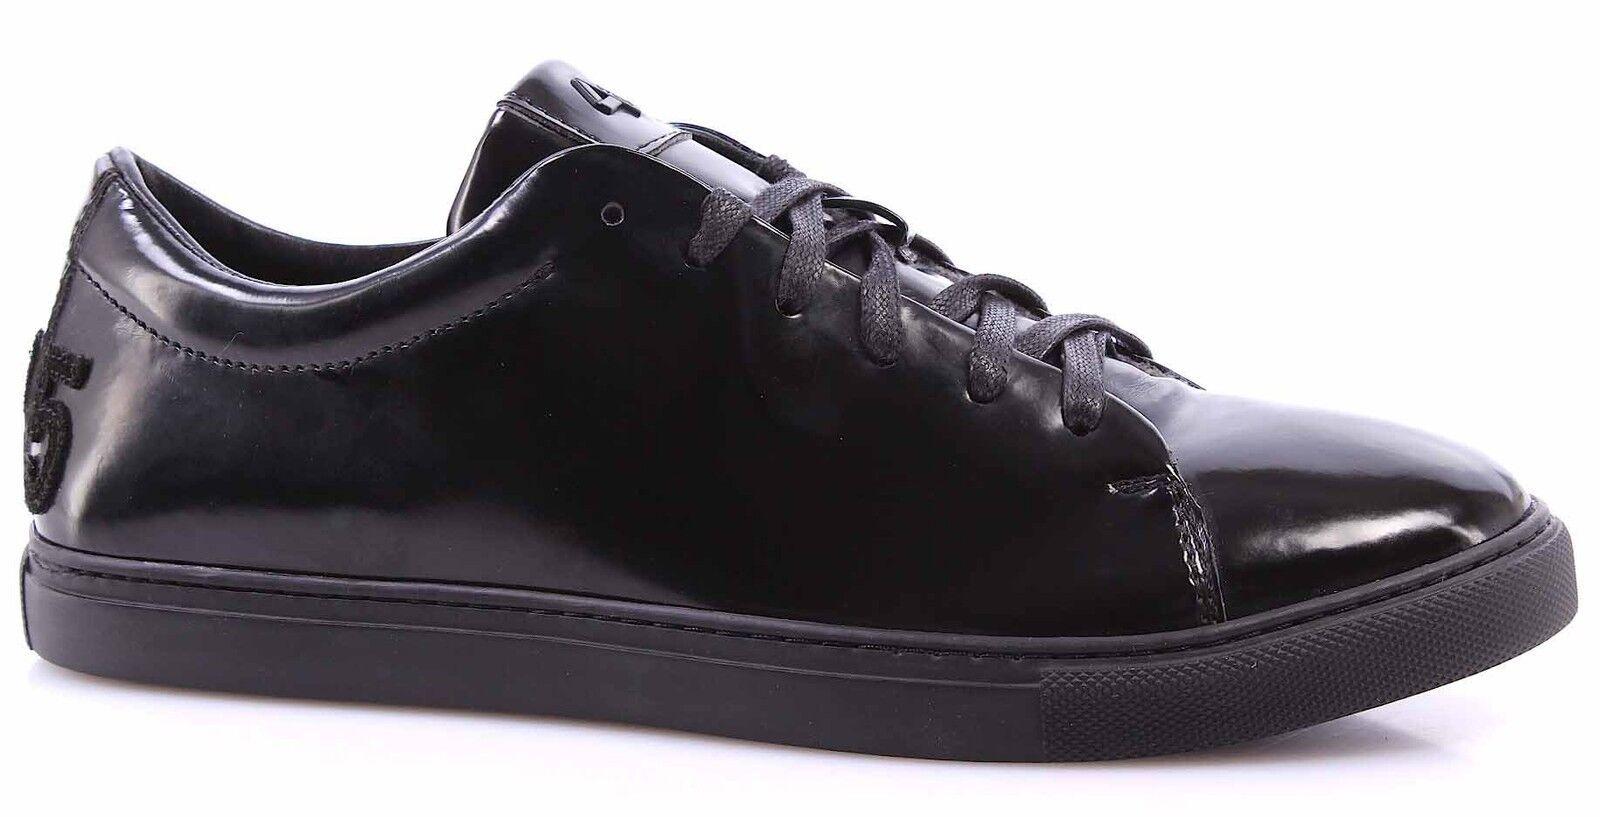 Scarpe Uomo Sneakers CYCLE 313946P LU1 Luxury Nero Italy Pelle Lucida Made In Italy Nero fad90e